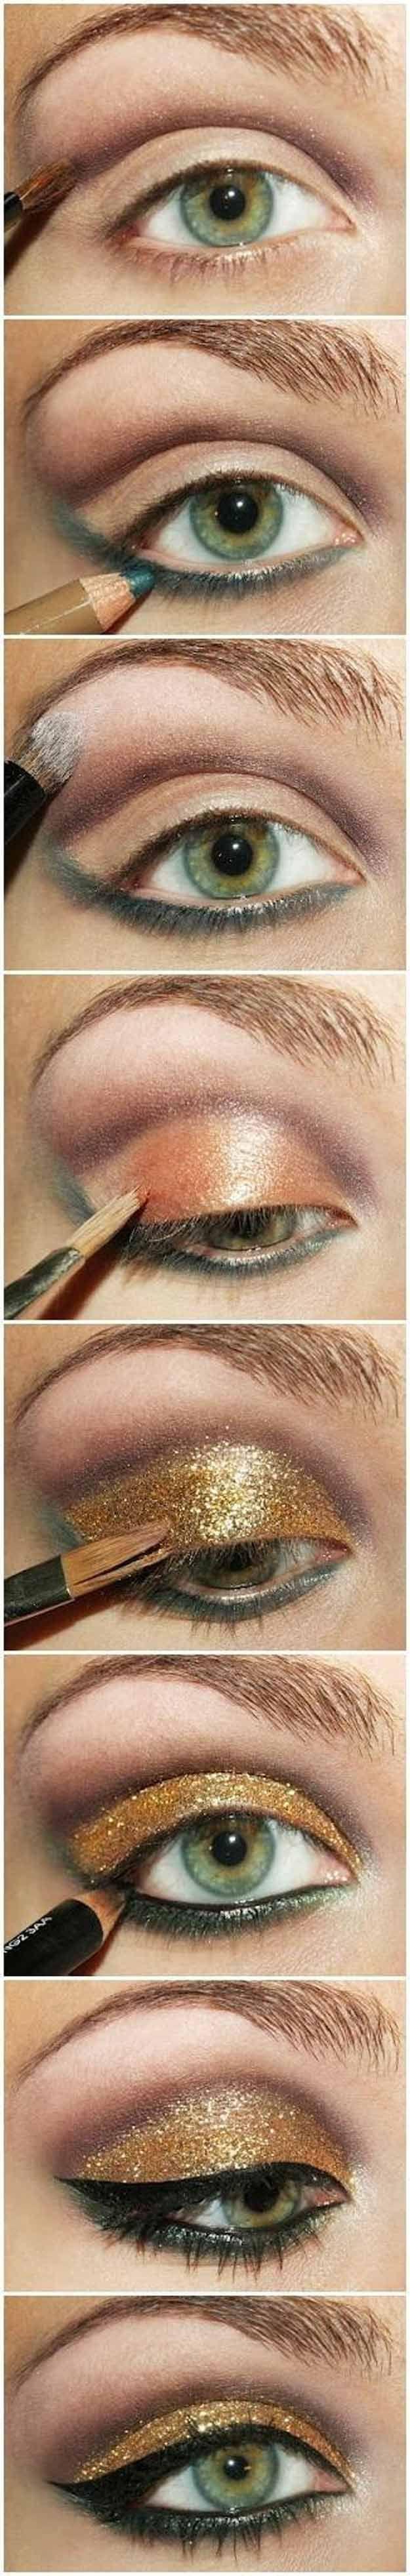 awesome eye makeup tutorial